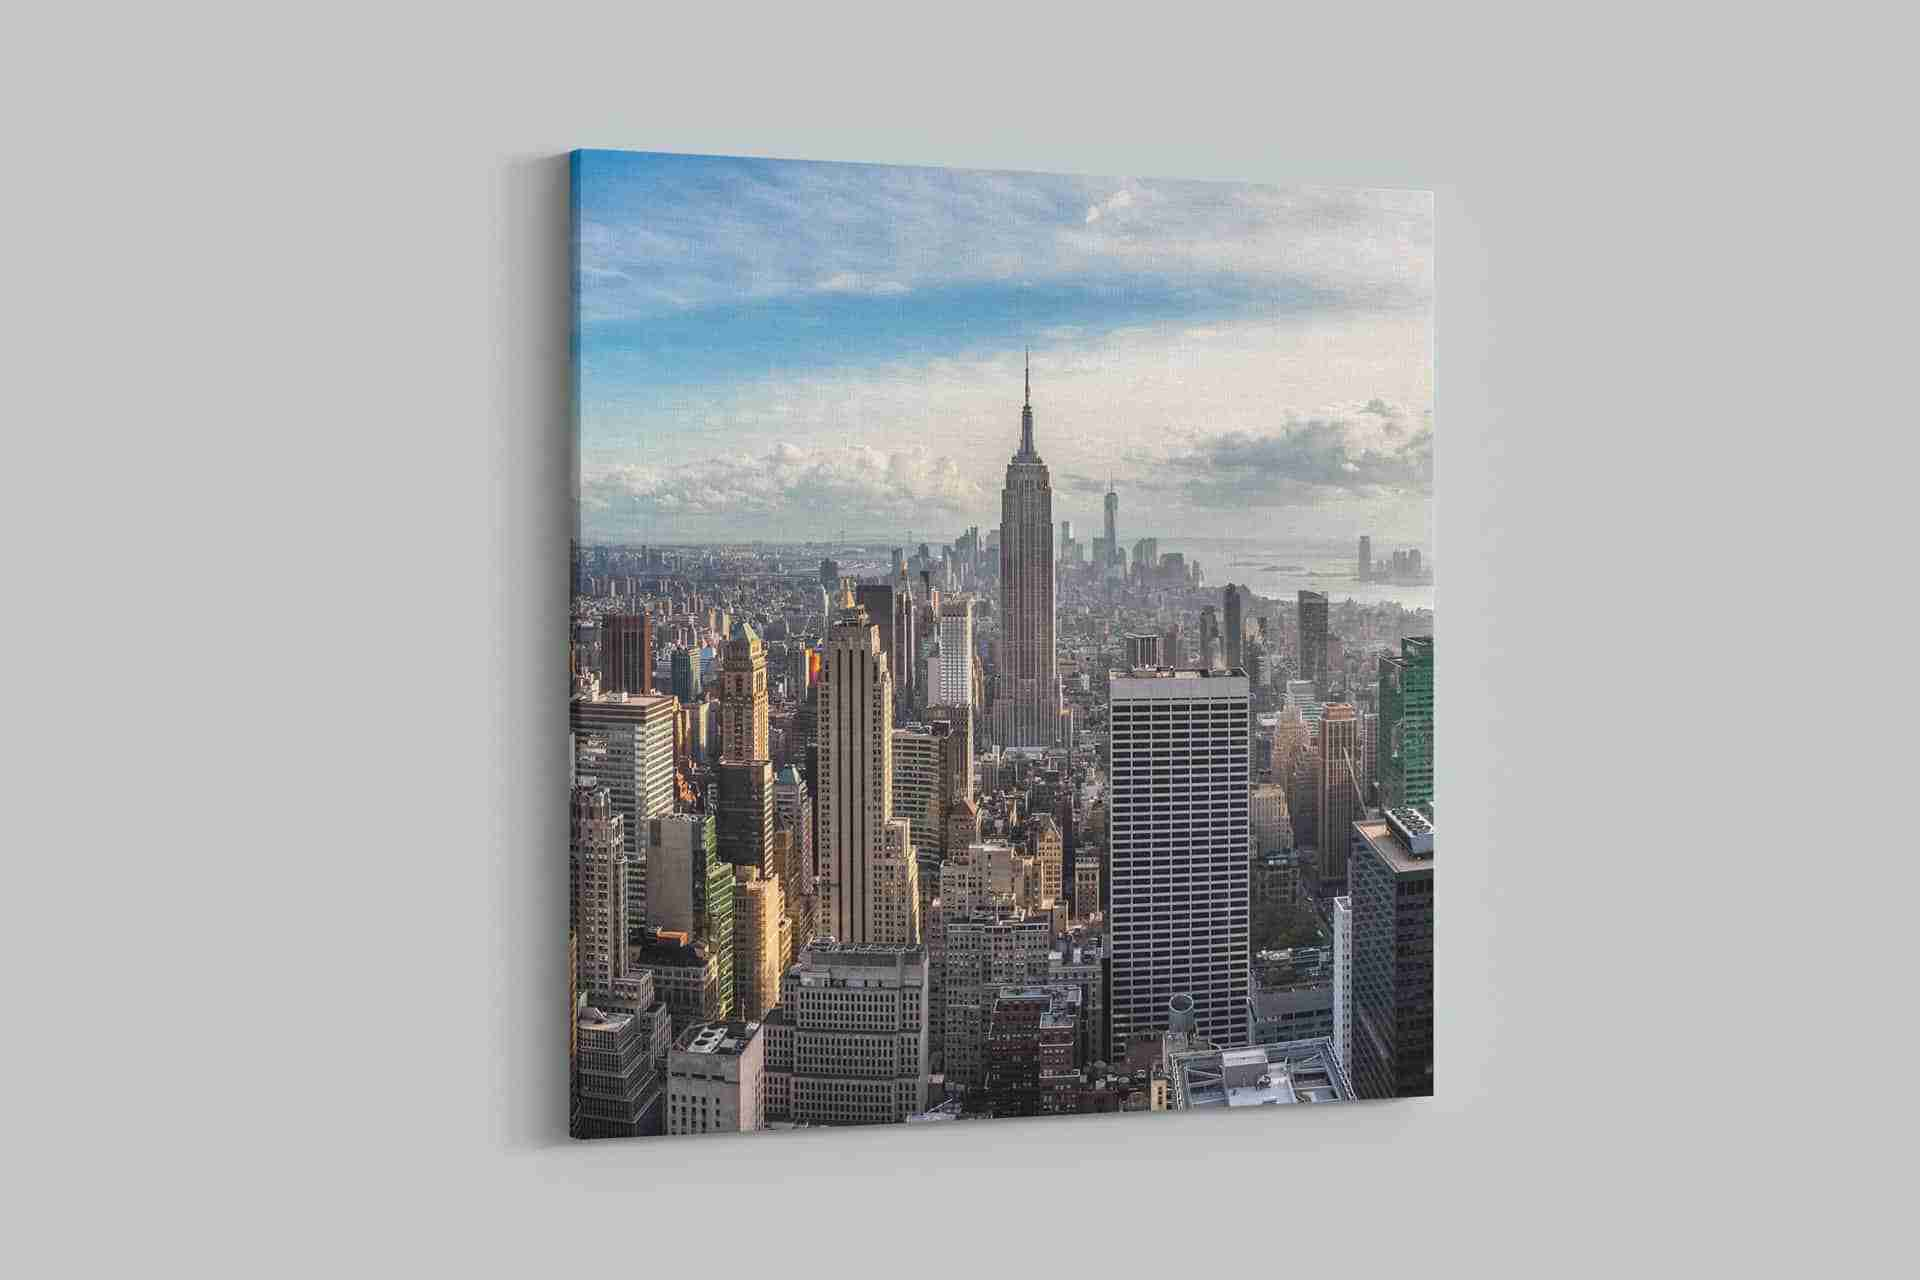 canvas-print-getitprinted.com-square-1.jpg